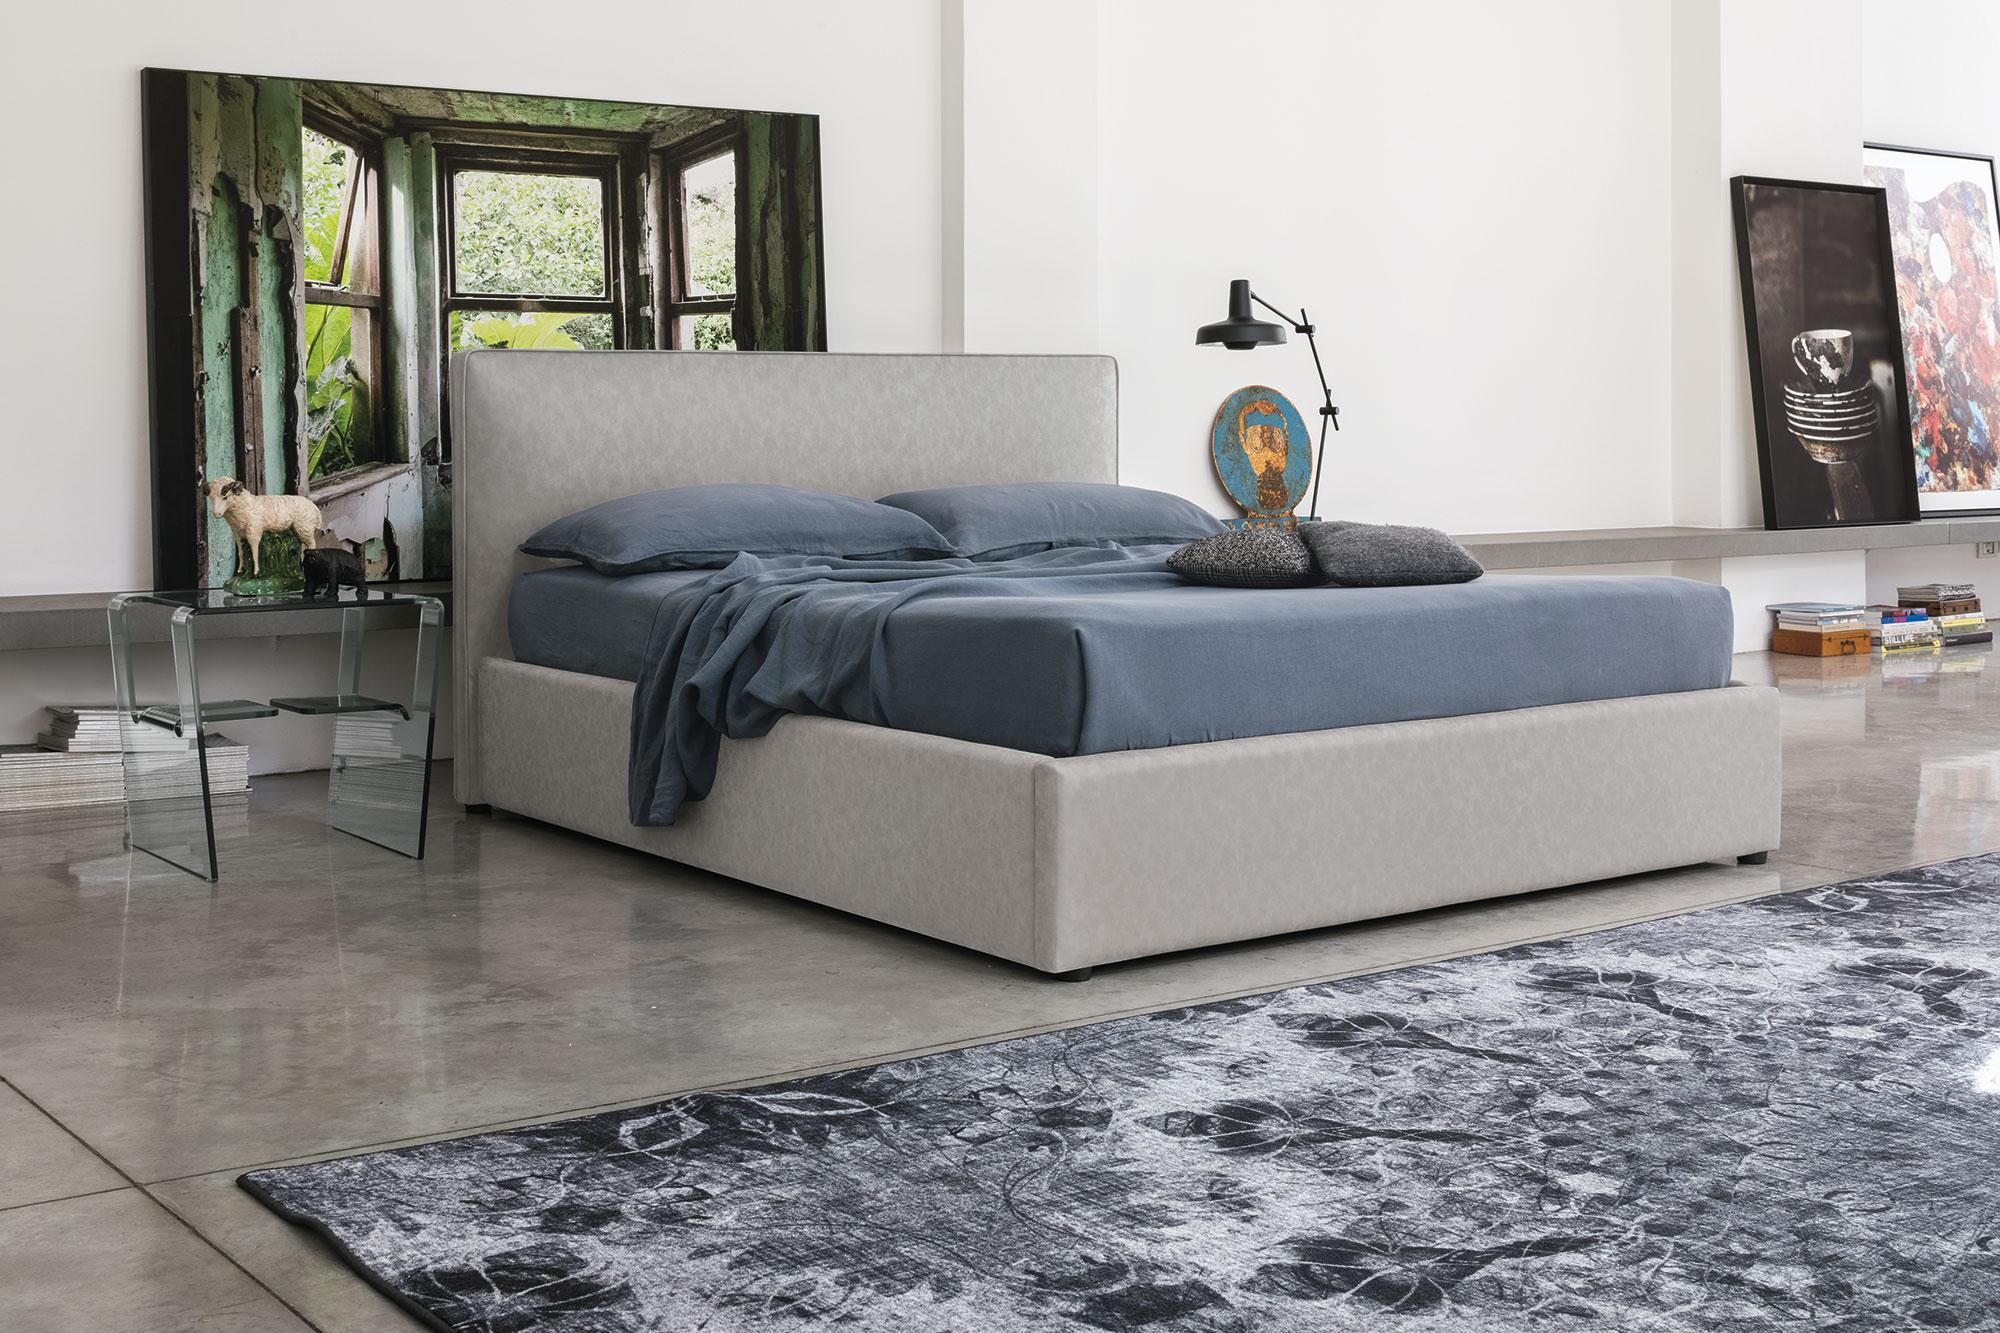 dermatino gkri krevati xoris podia, lather grey bed with no legs, simple leather bed, aplo gkrizo dermatino krevati,